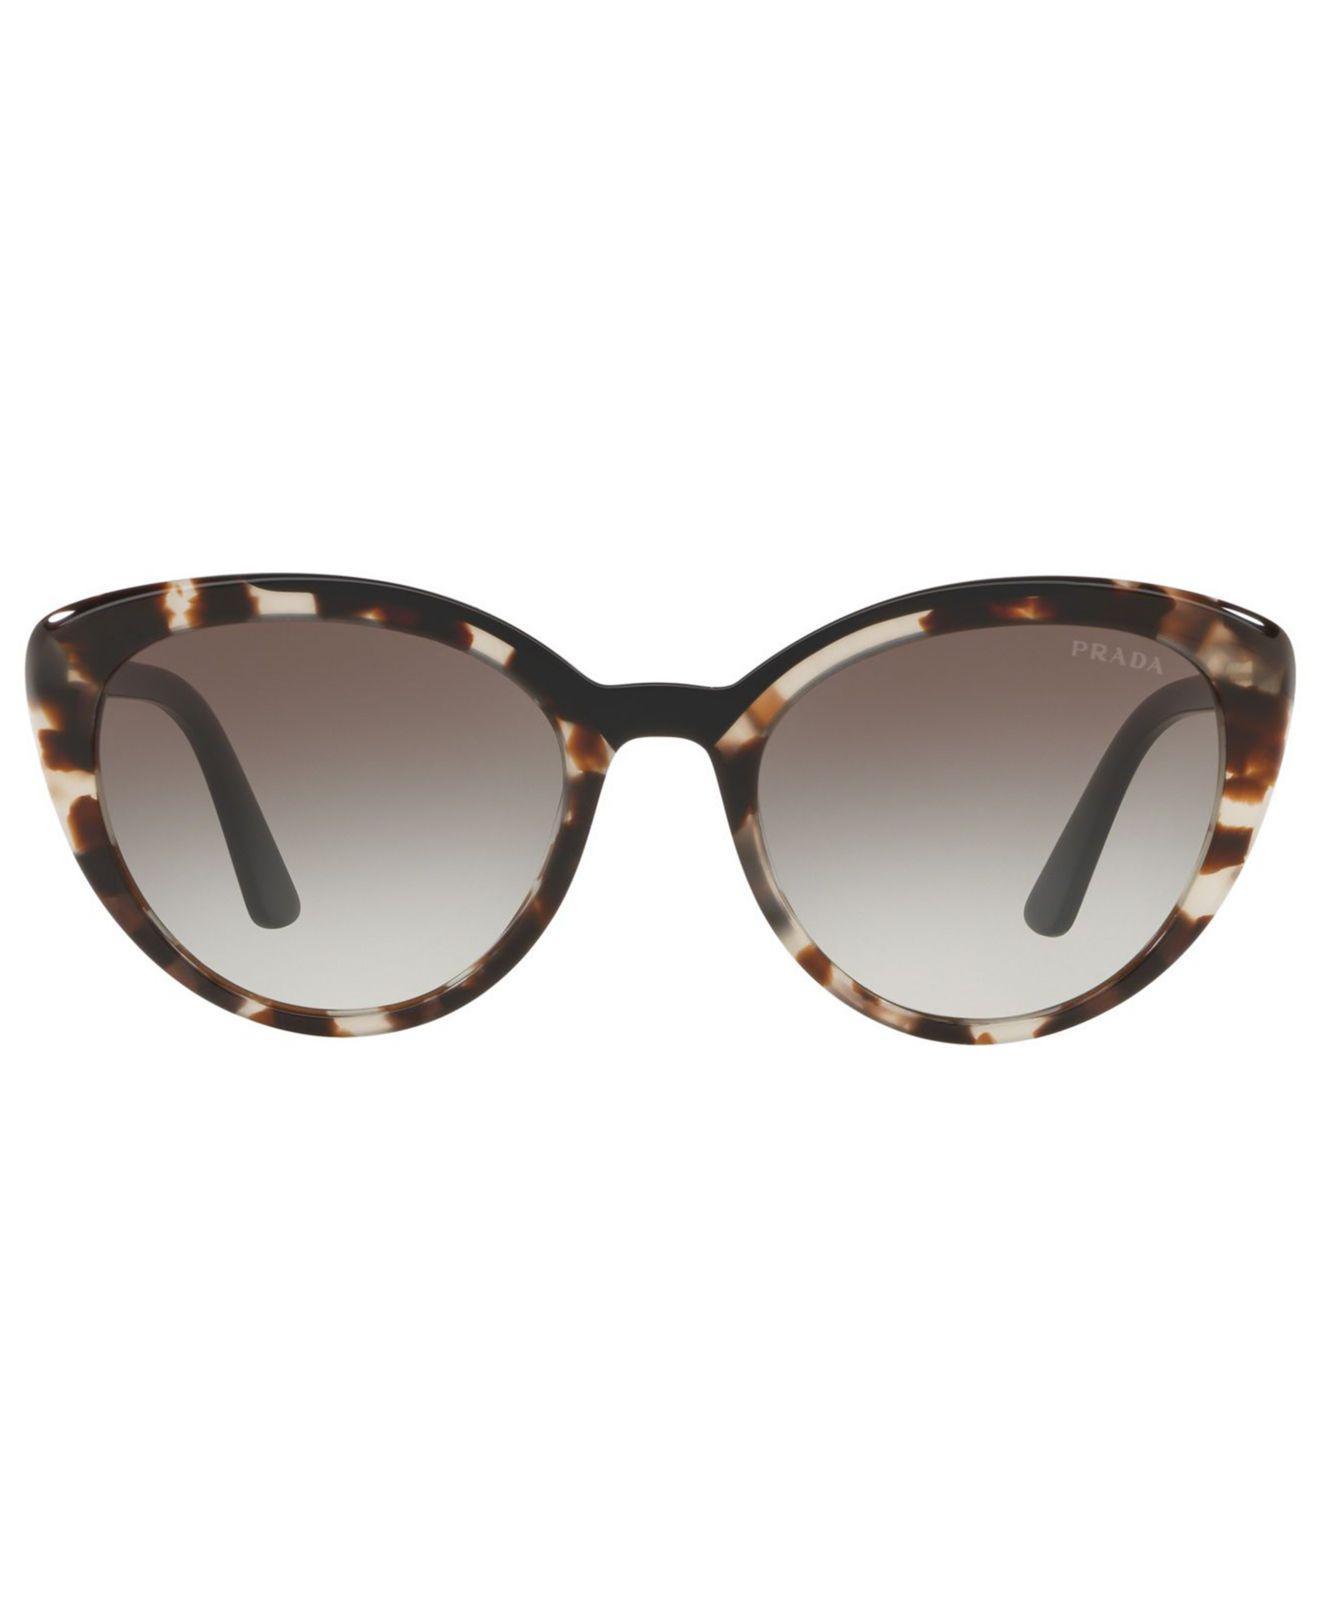 c3e5bec544 Prada 02vs Cat Eye Sunglasses in Gray - Lyst